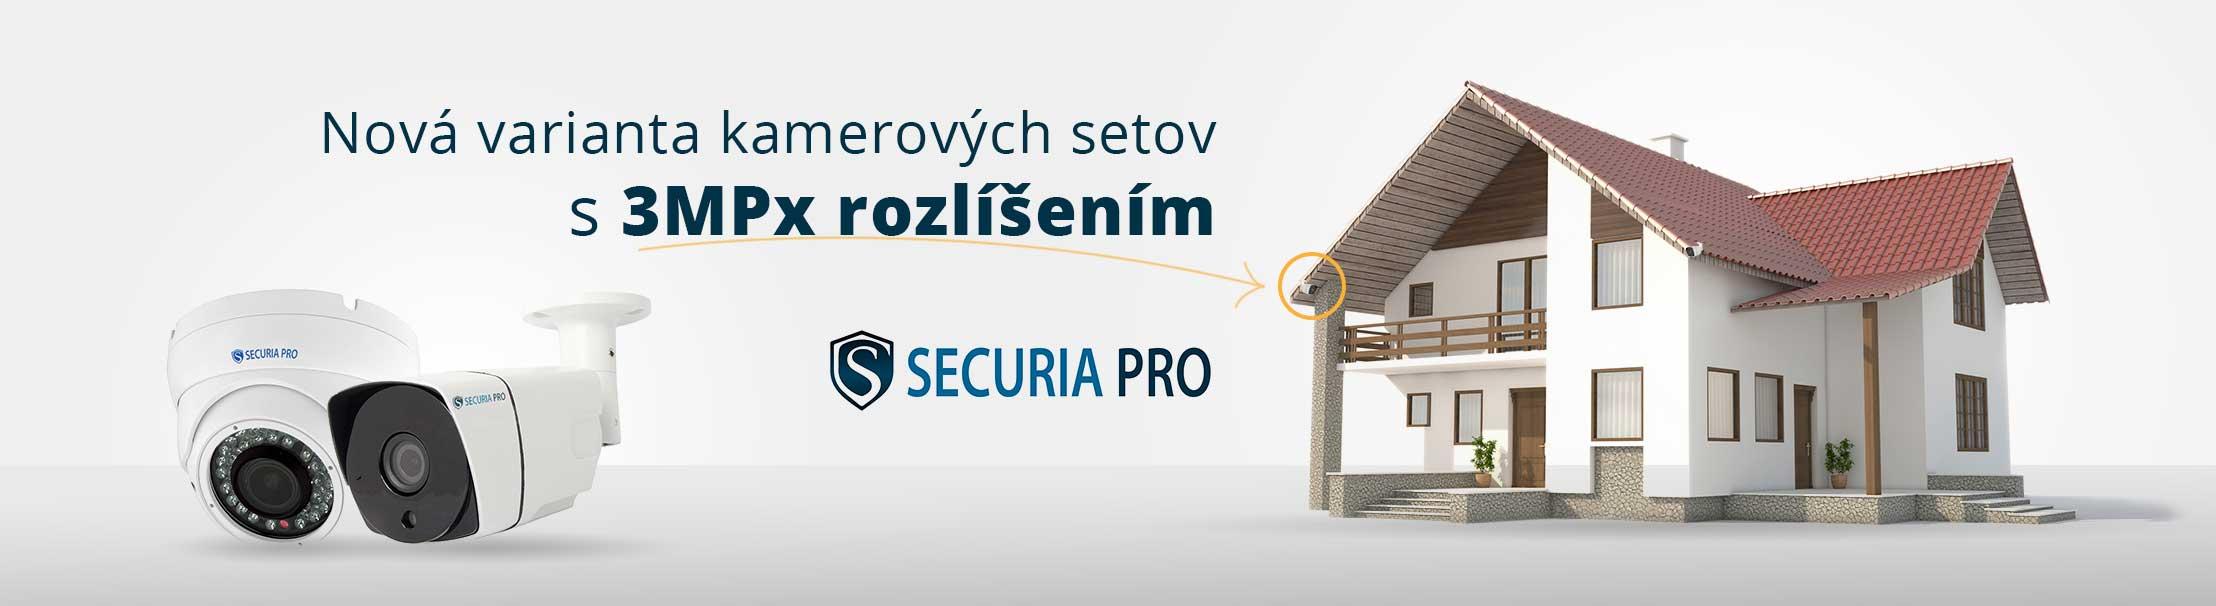 Securia Pro 3MPx